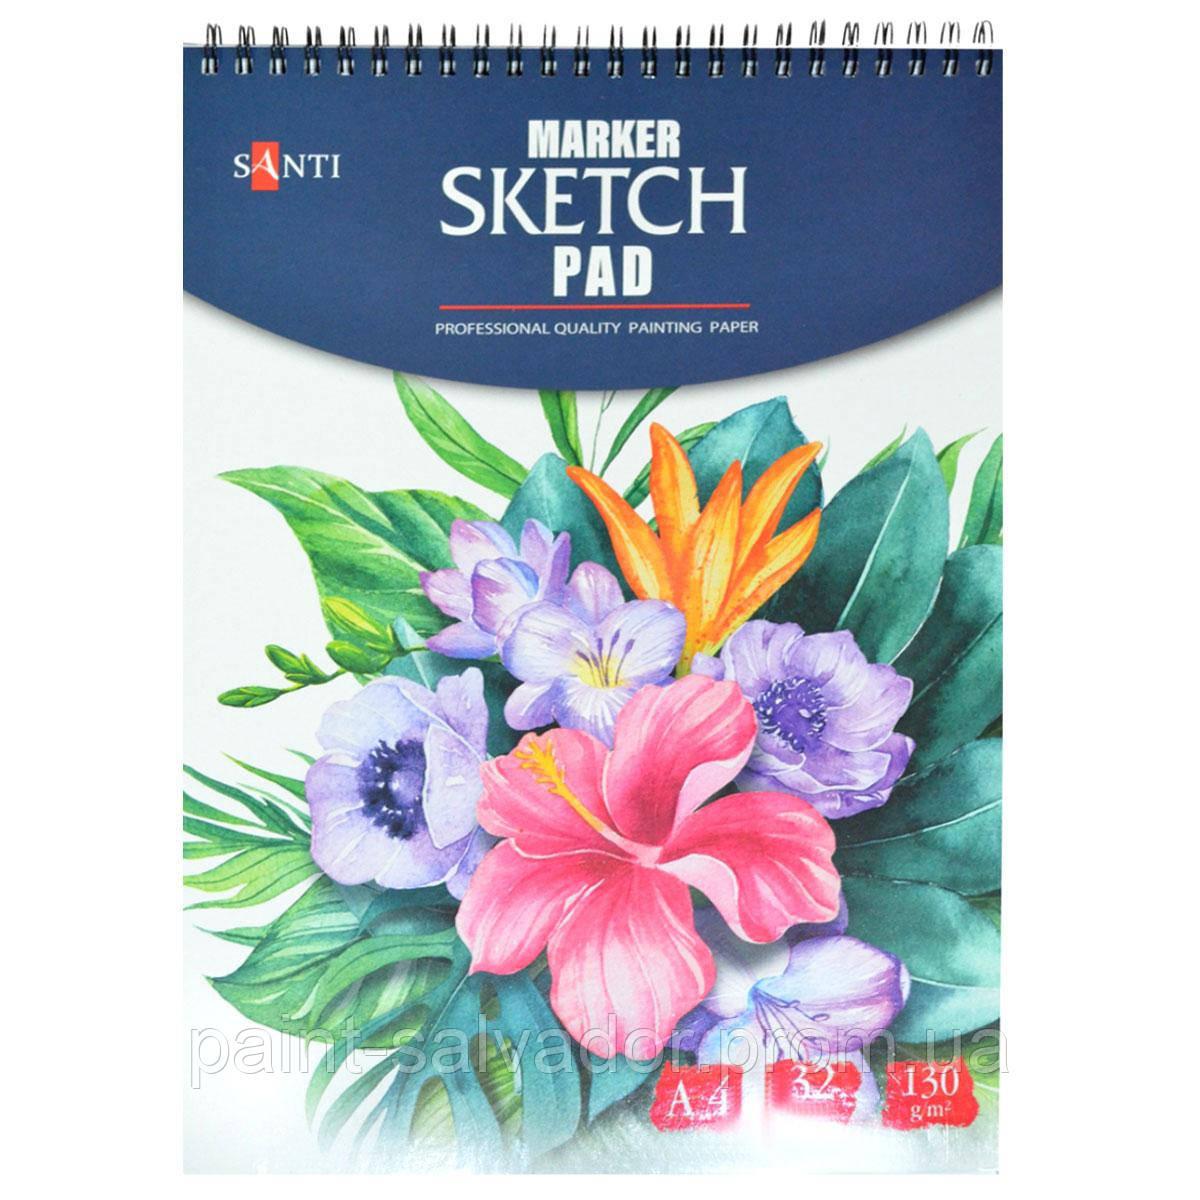 Альбом для маркеров А4, 32 лист, 130гр, Marker sketch pad  Santi 742612